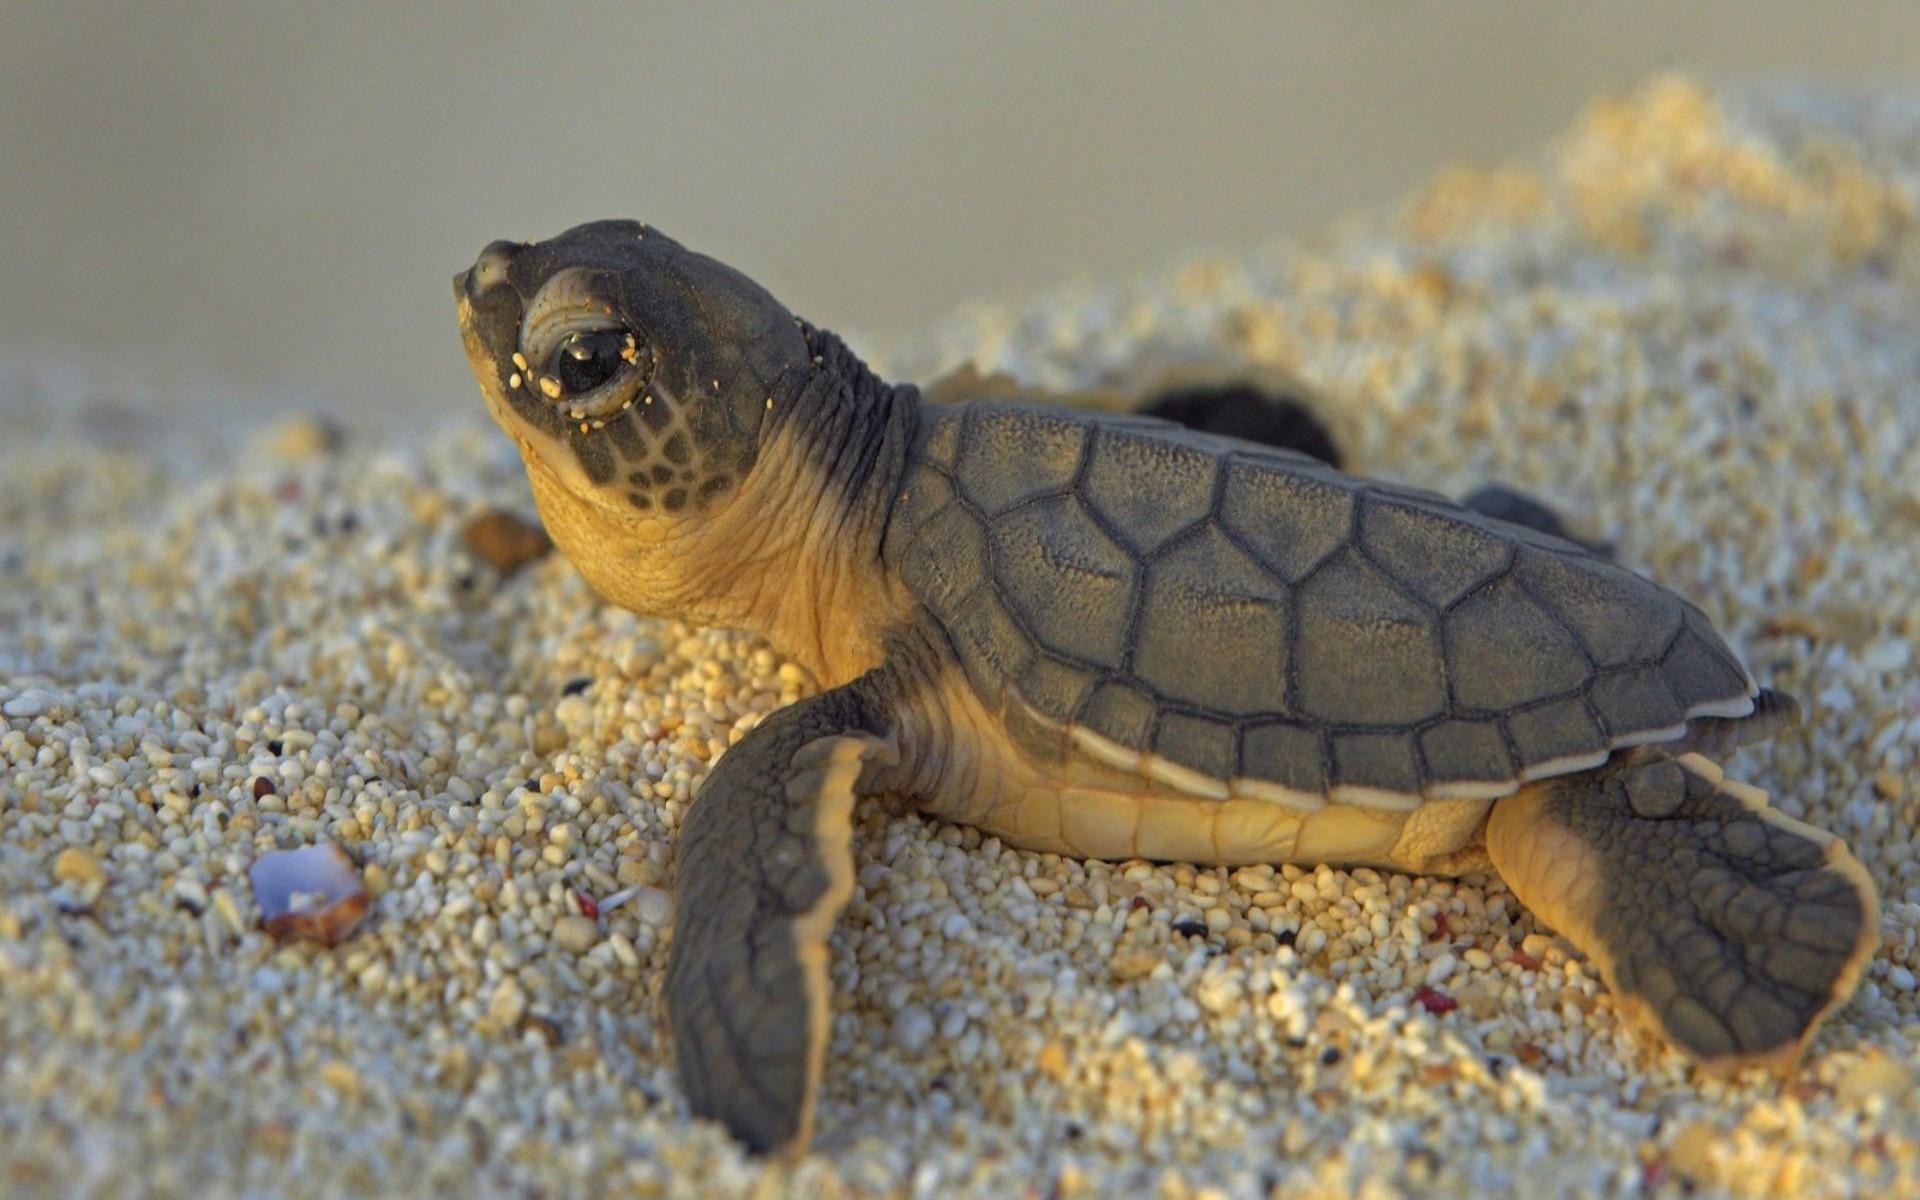 Cute turtle wallpaper 59 images - Cute turtle pics ...